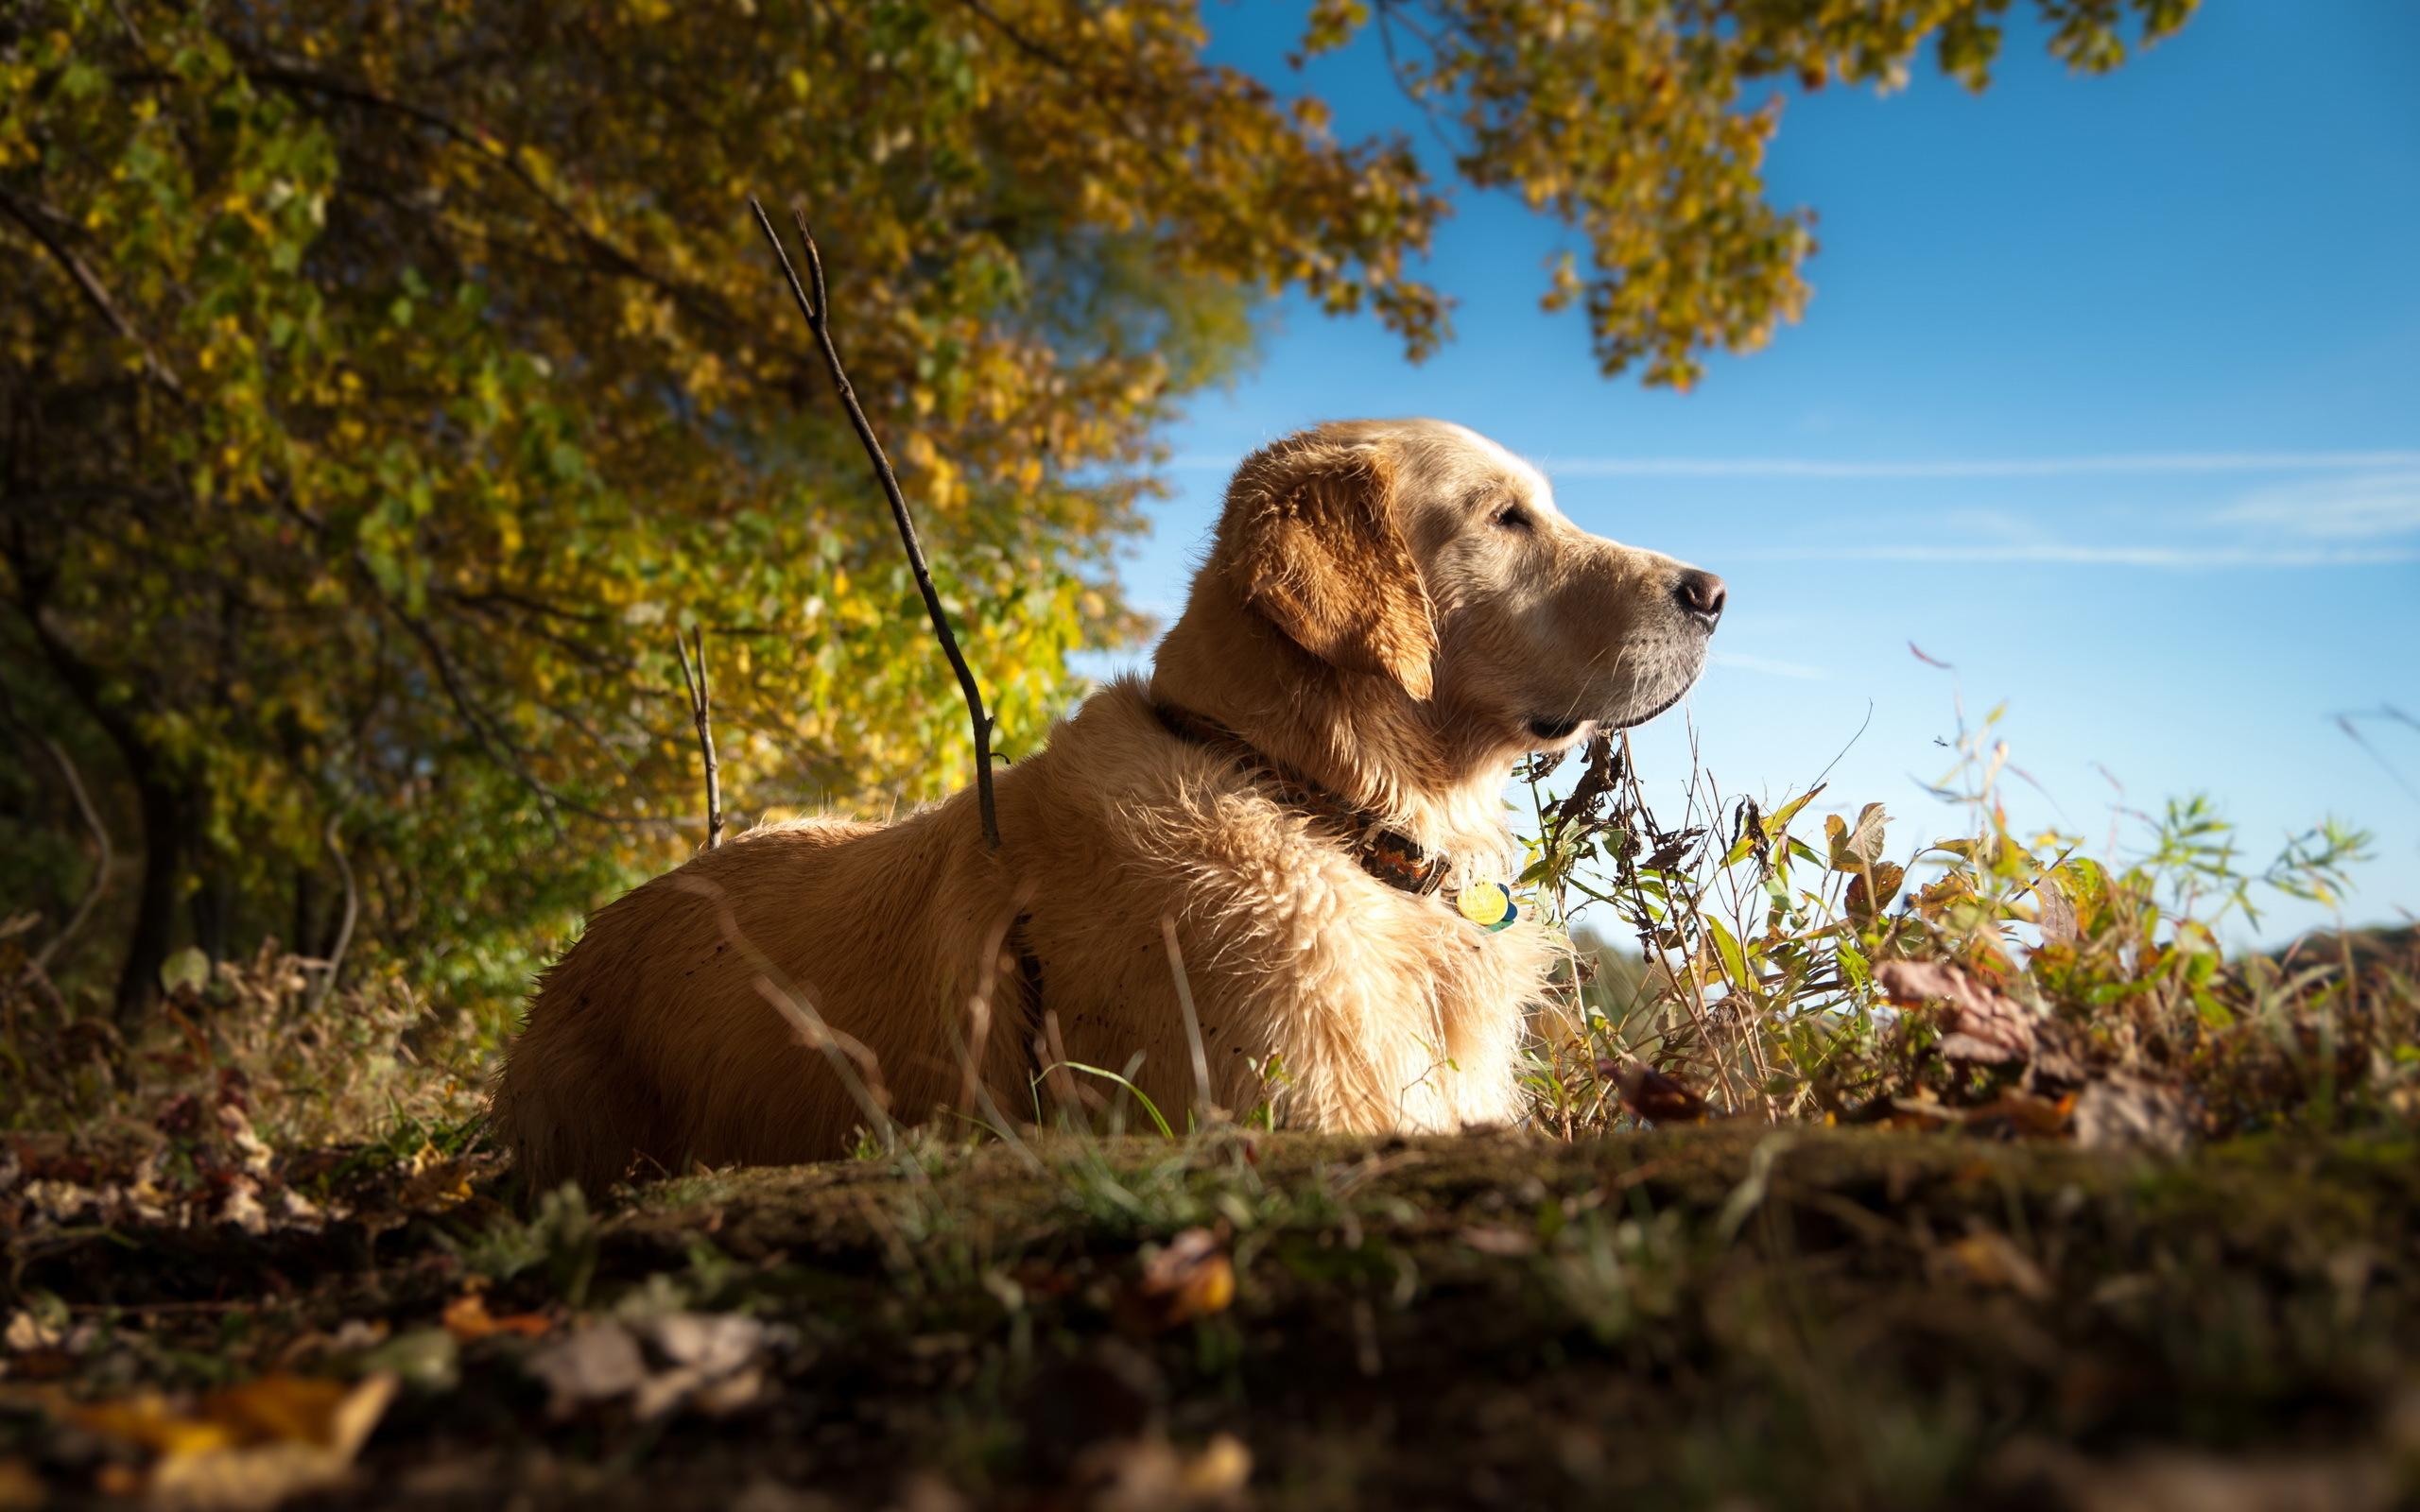 собака животное природа  № 690788 бесплатно